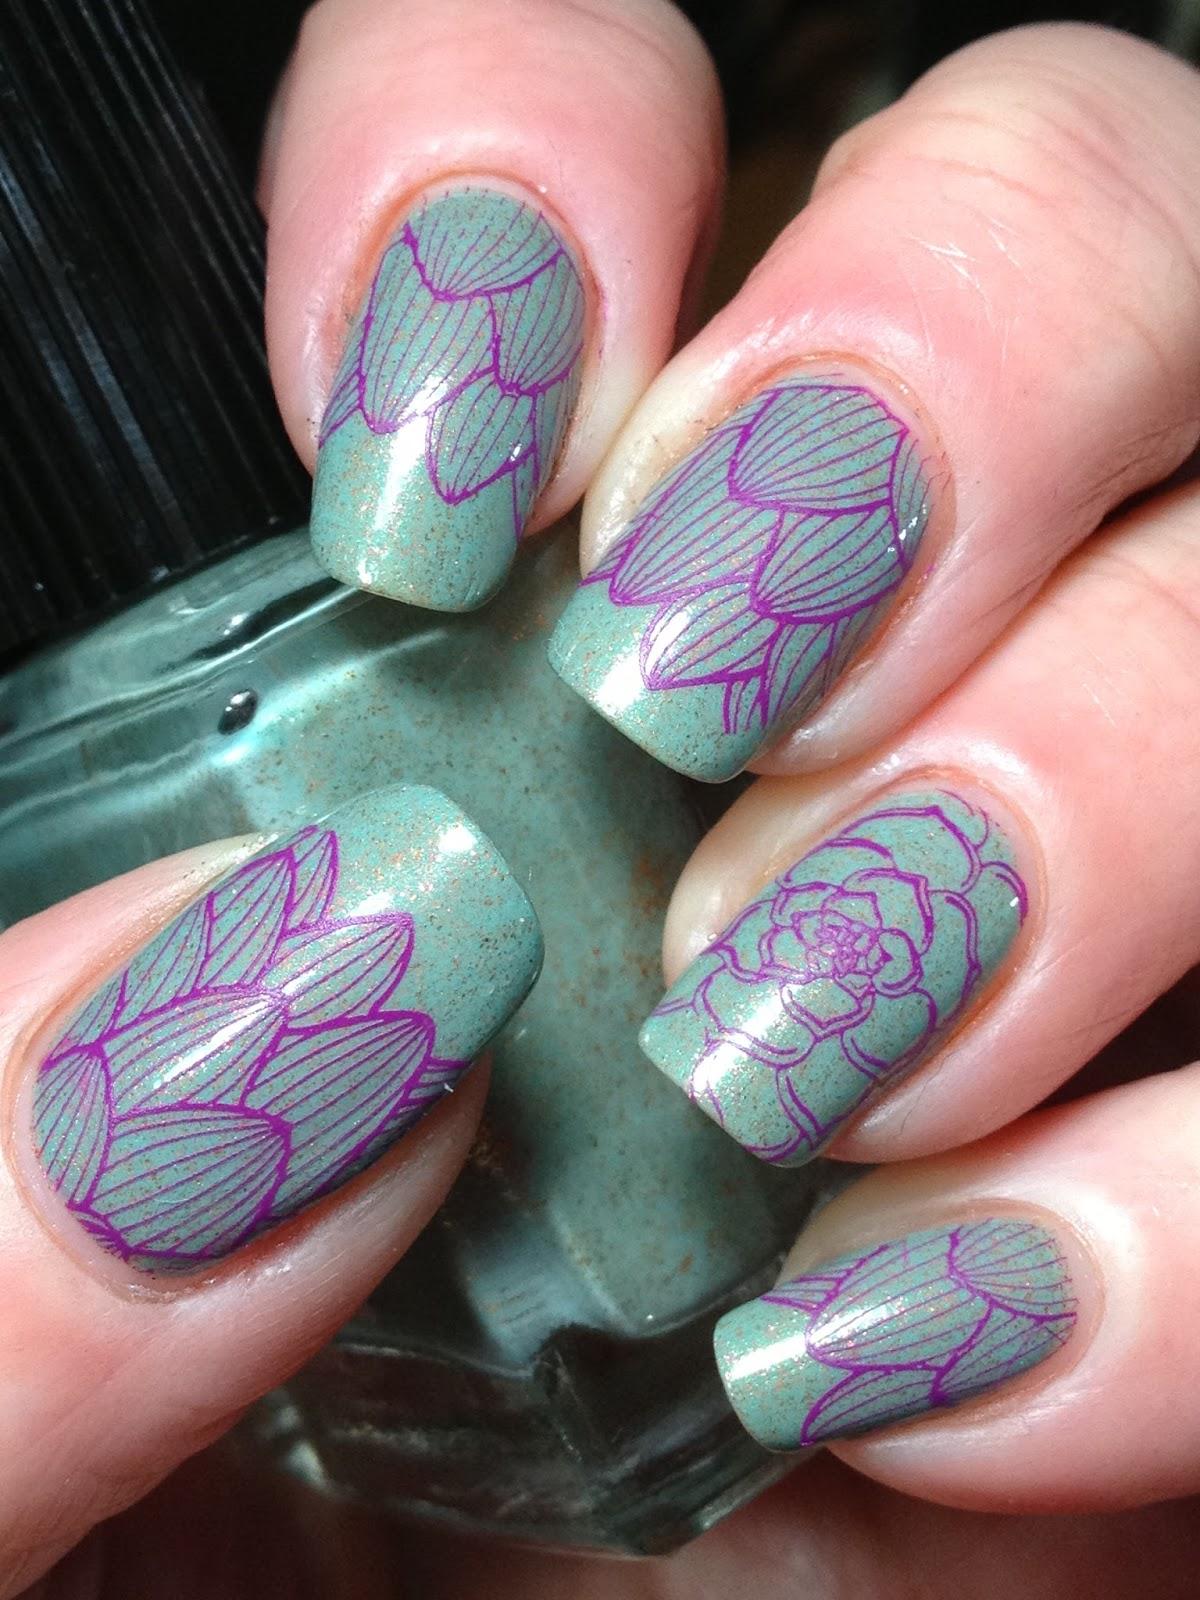 Canadian Nail Fanatic: 40 Great Nail Art Ideas Does Floral